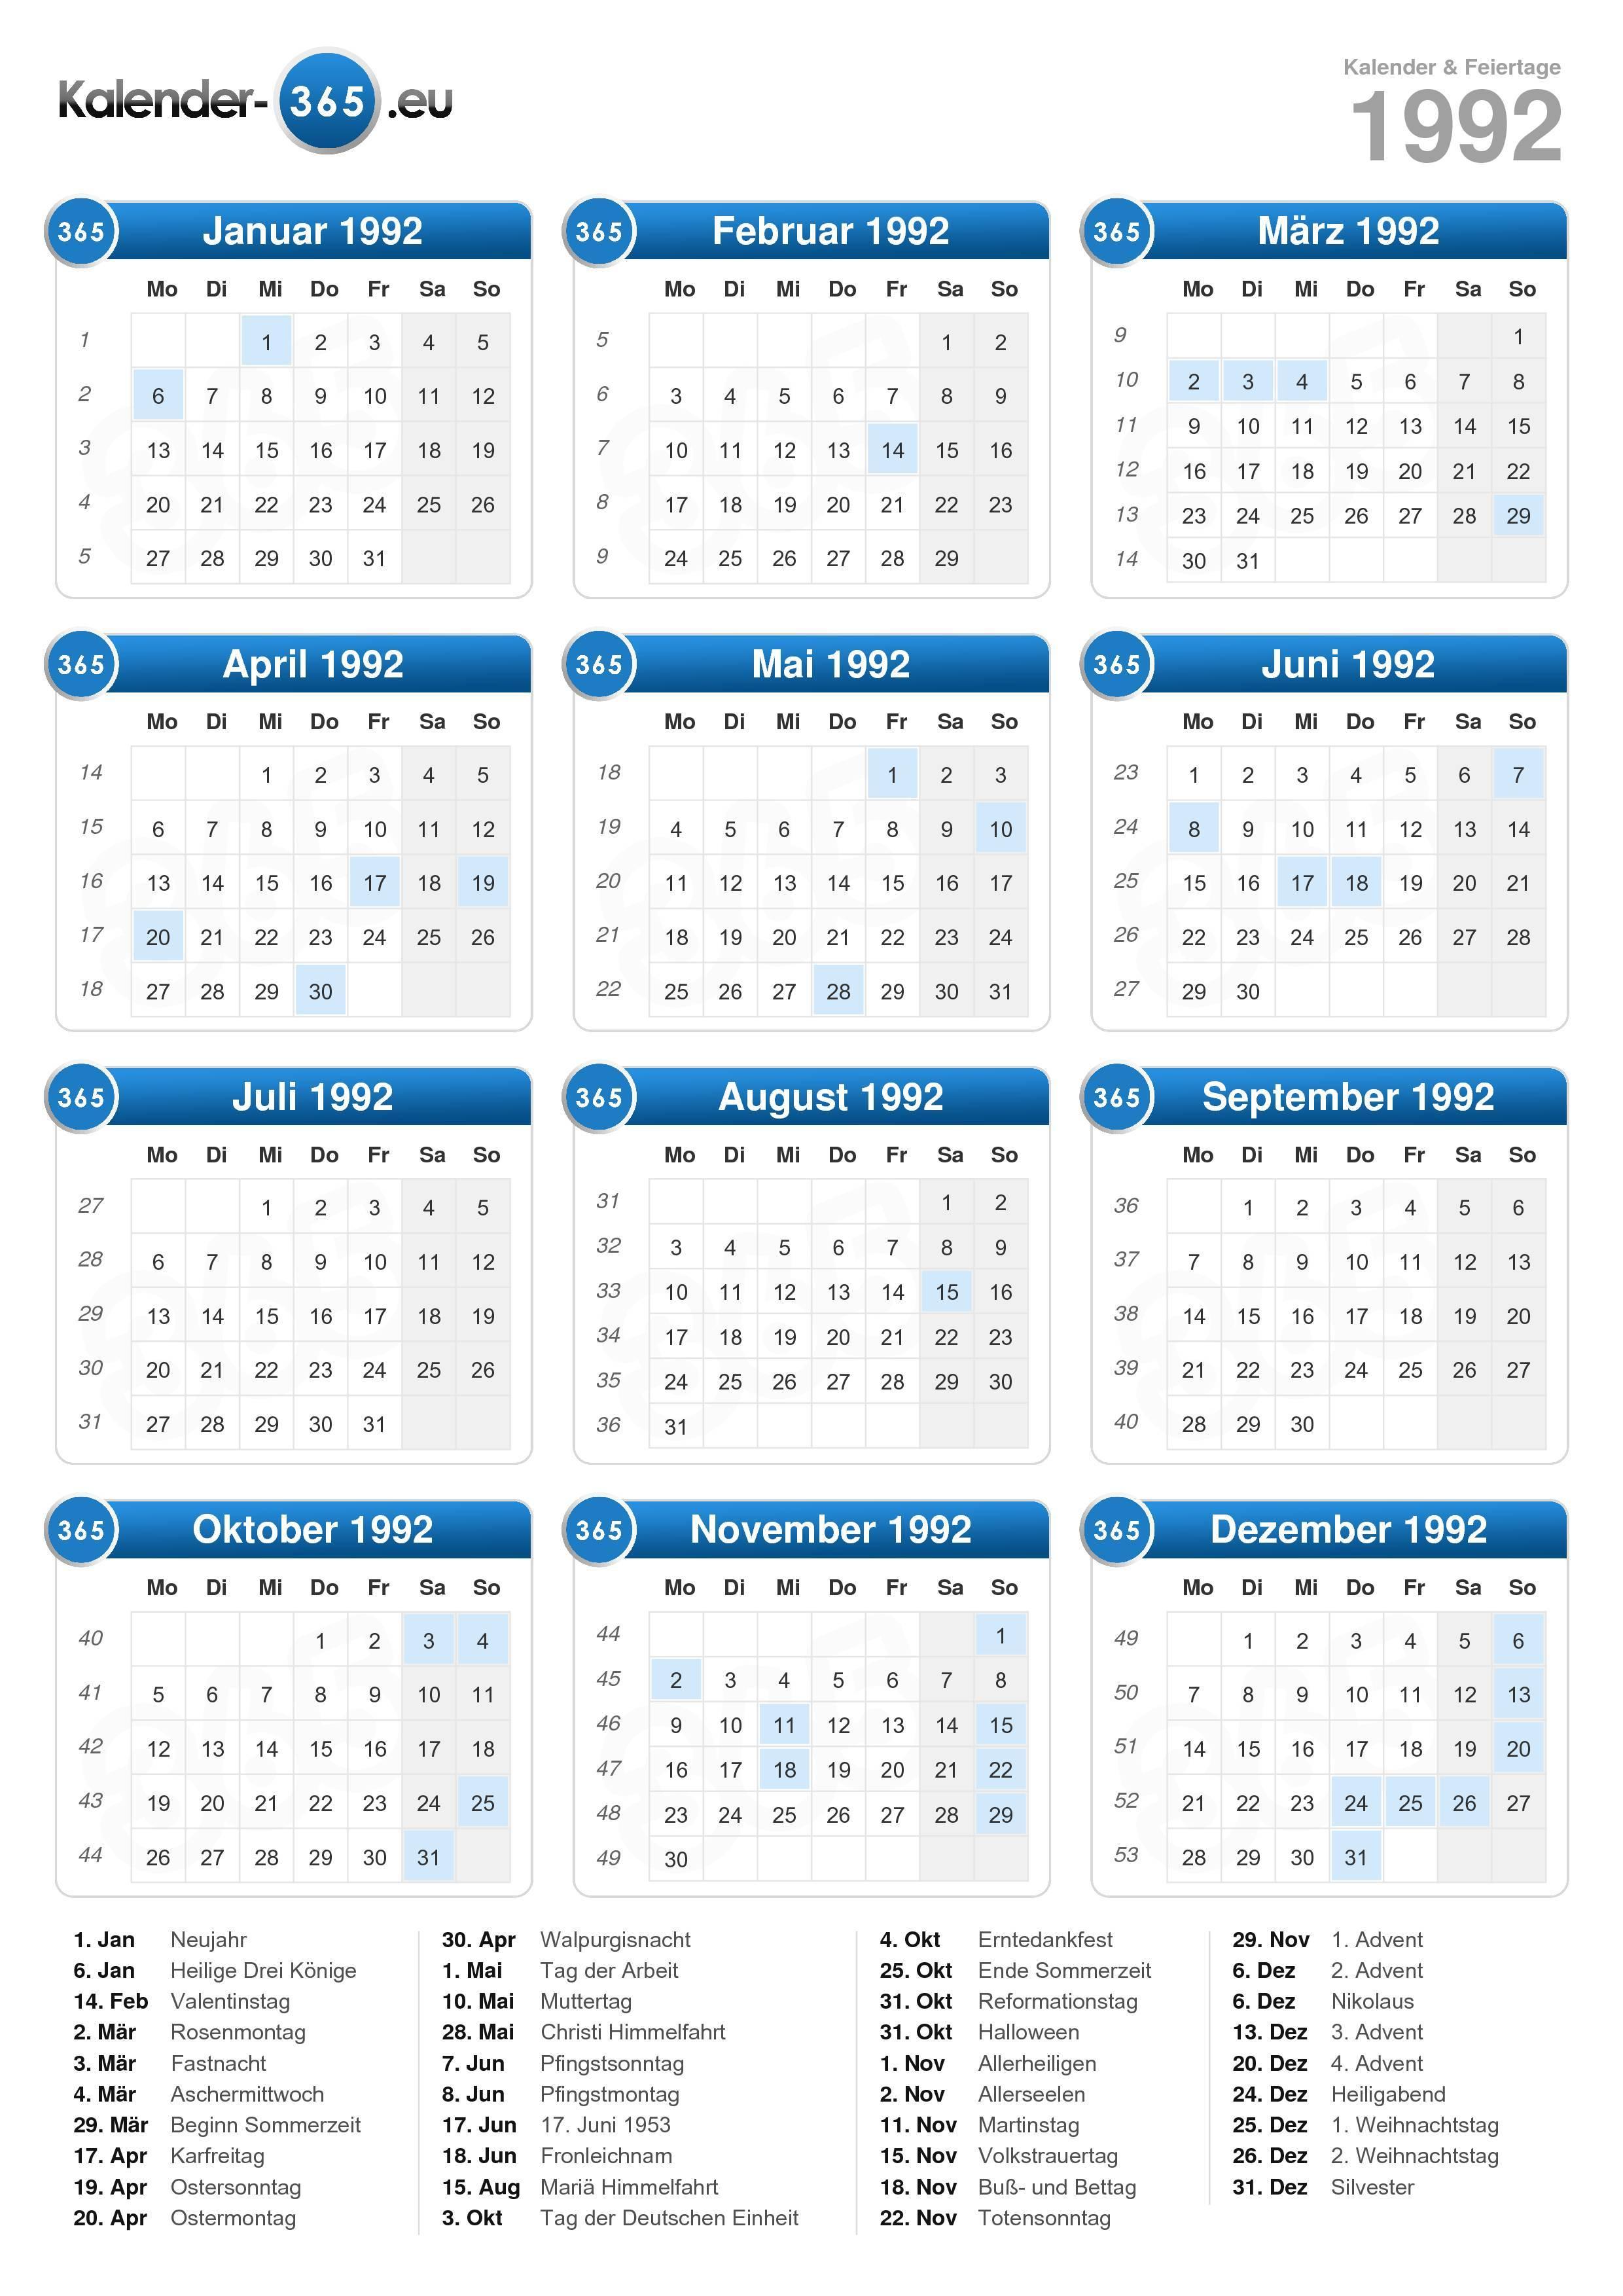 Kalender 1992